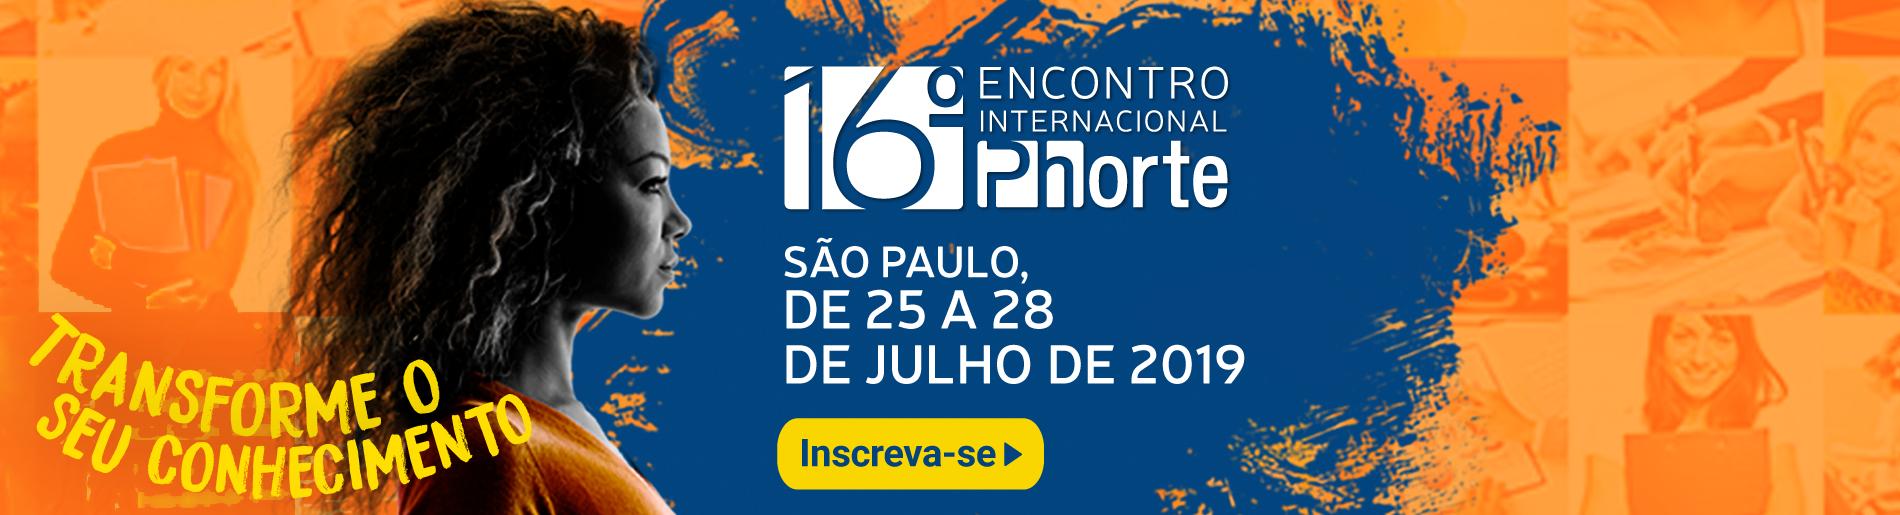 16º encontro internacional phorte